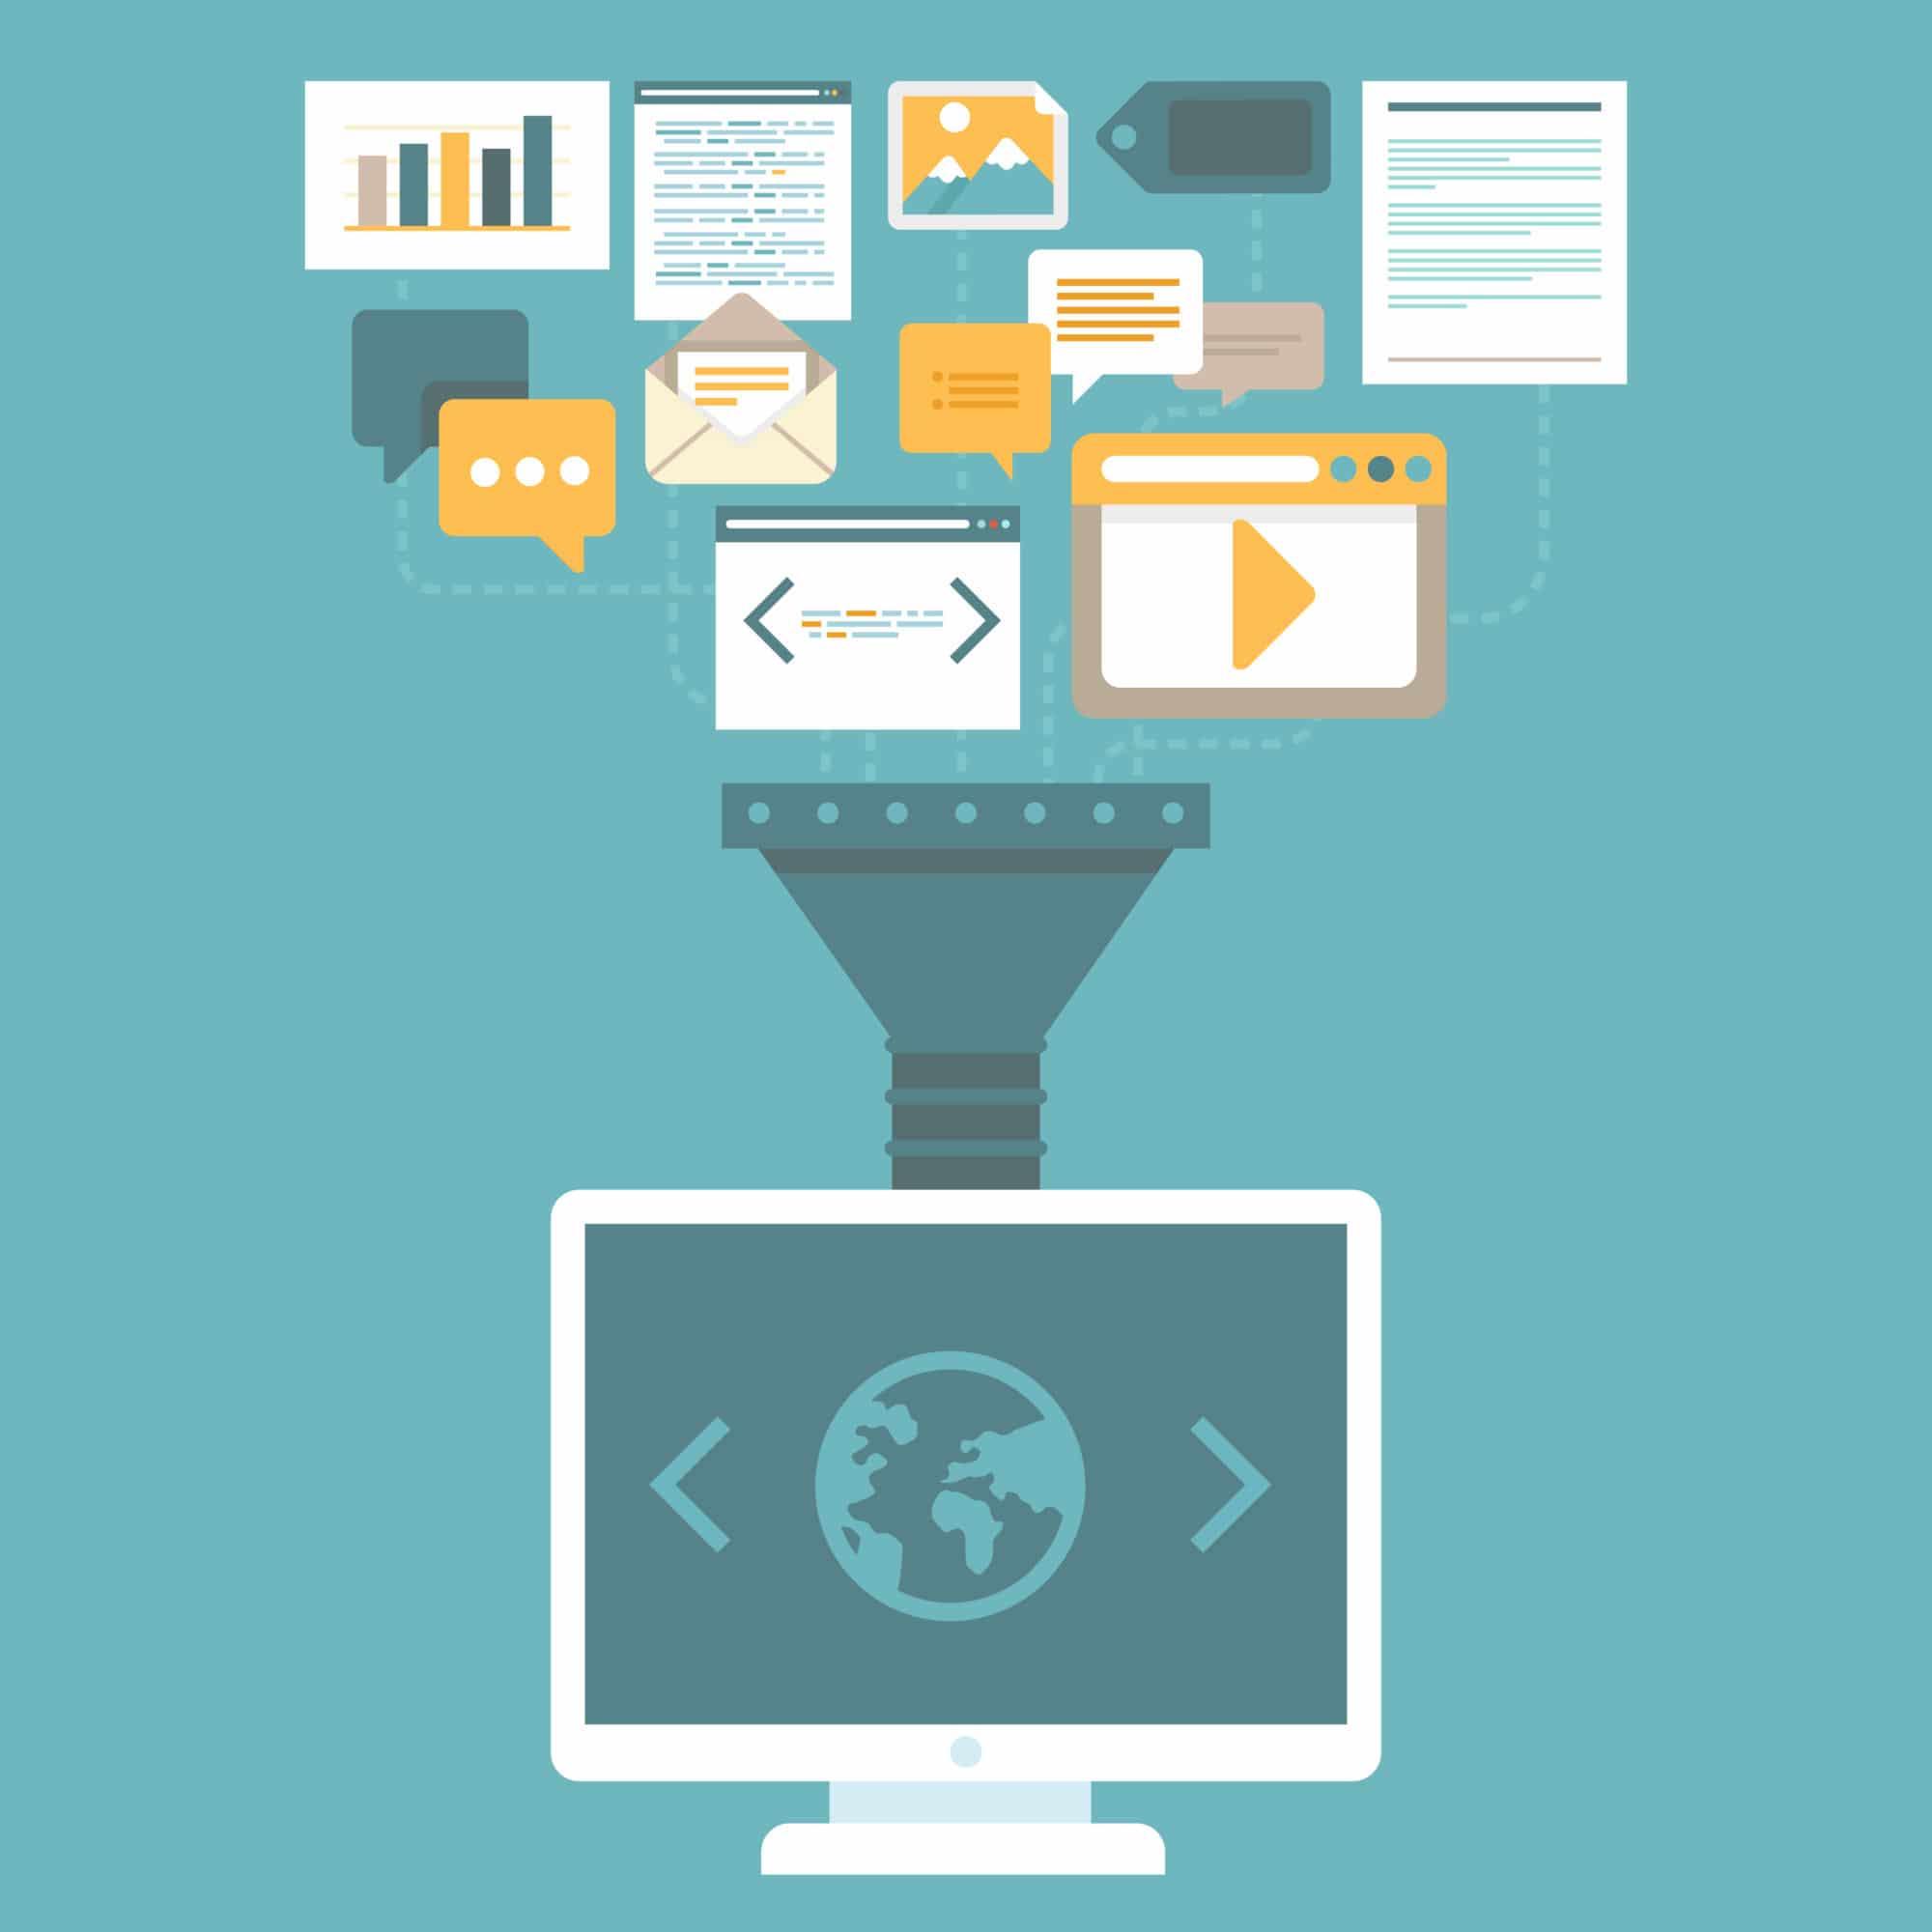 Monitorer vos sites : MainWp ou ManageWP ?